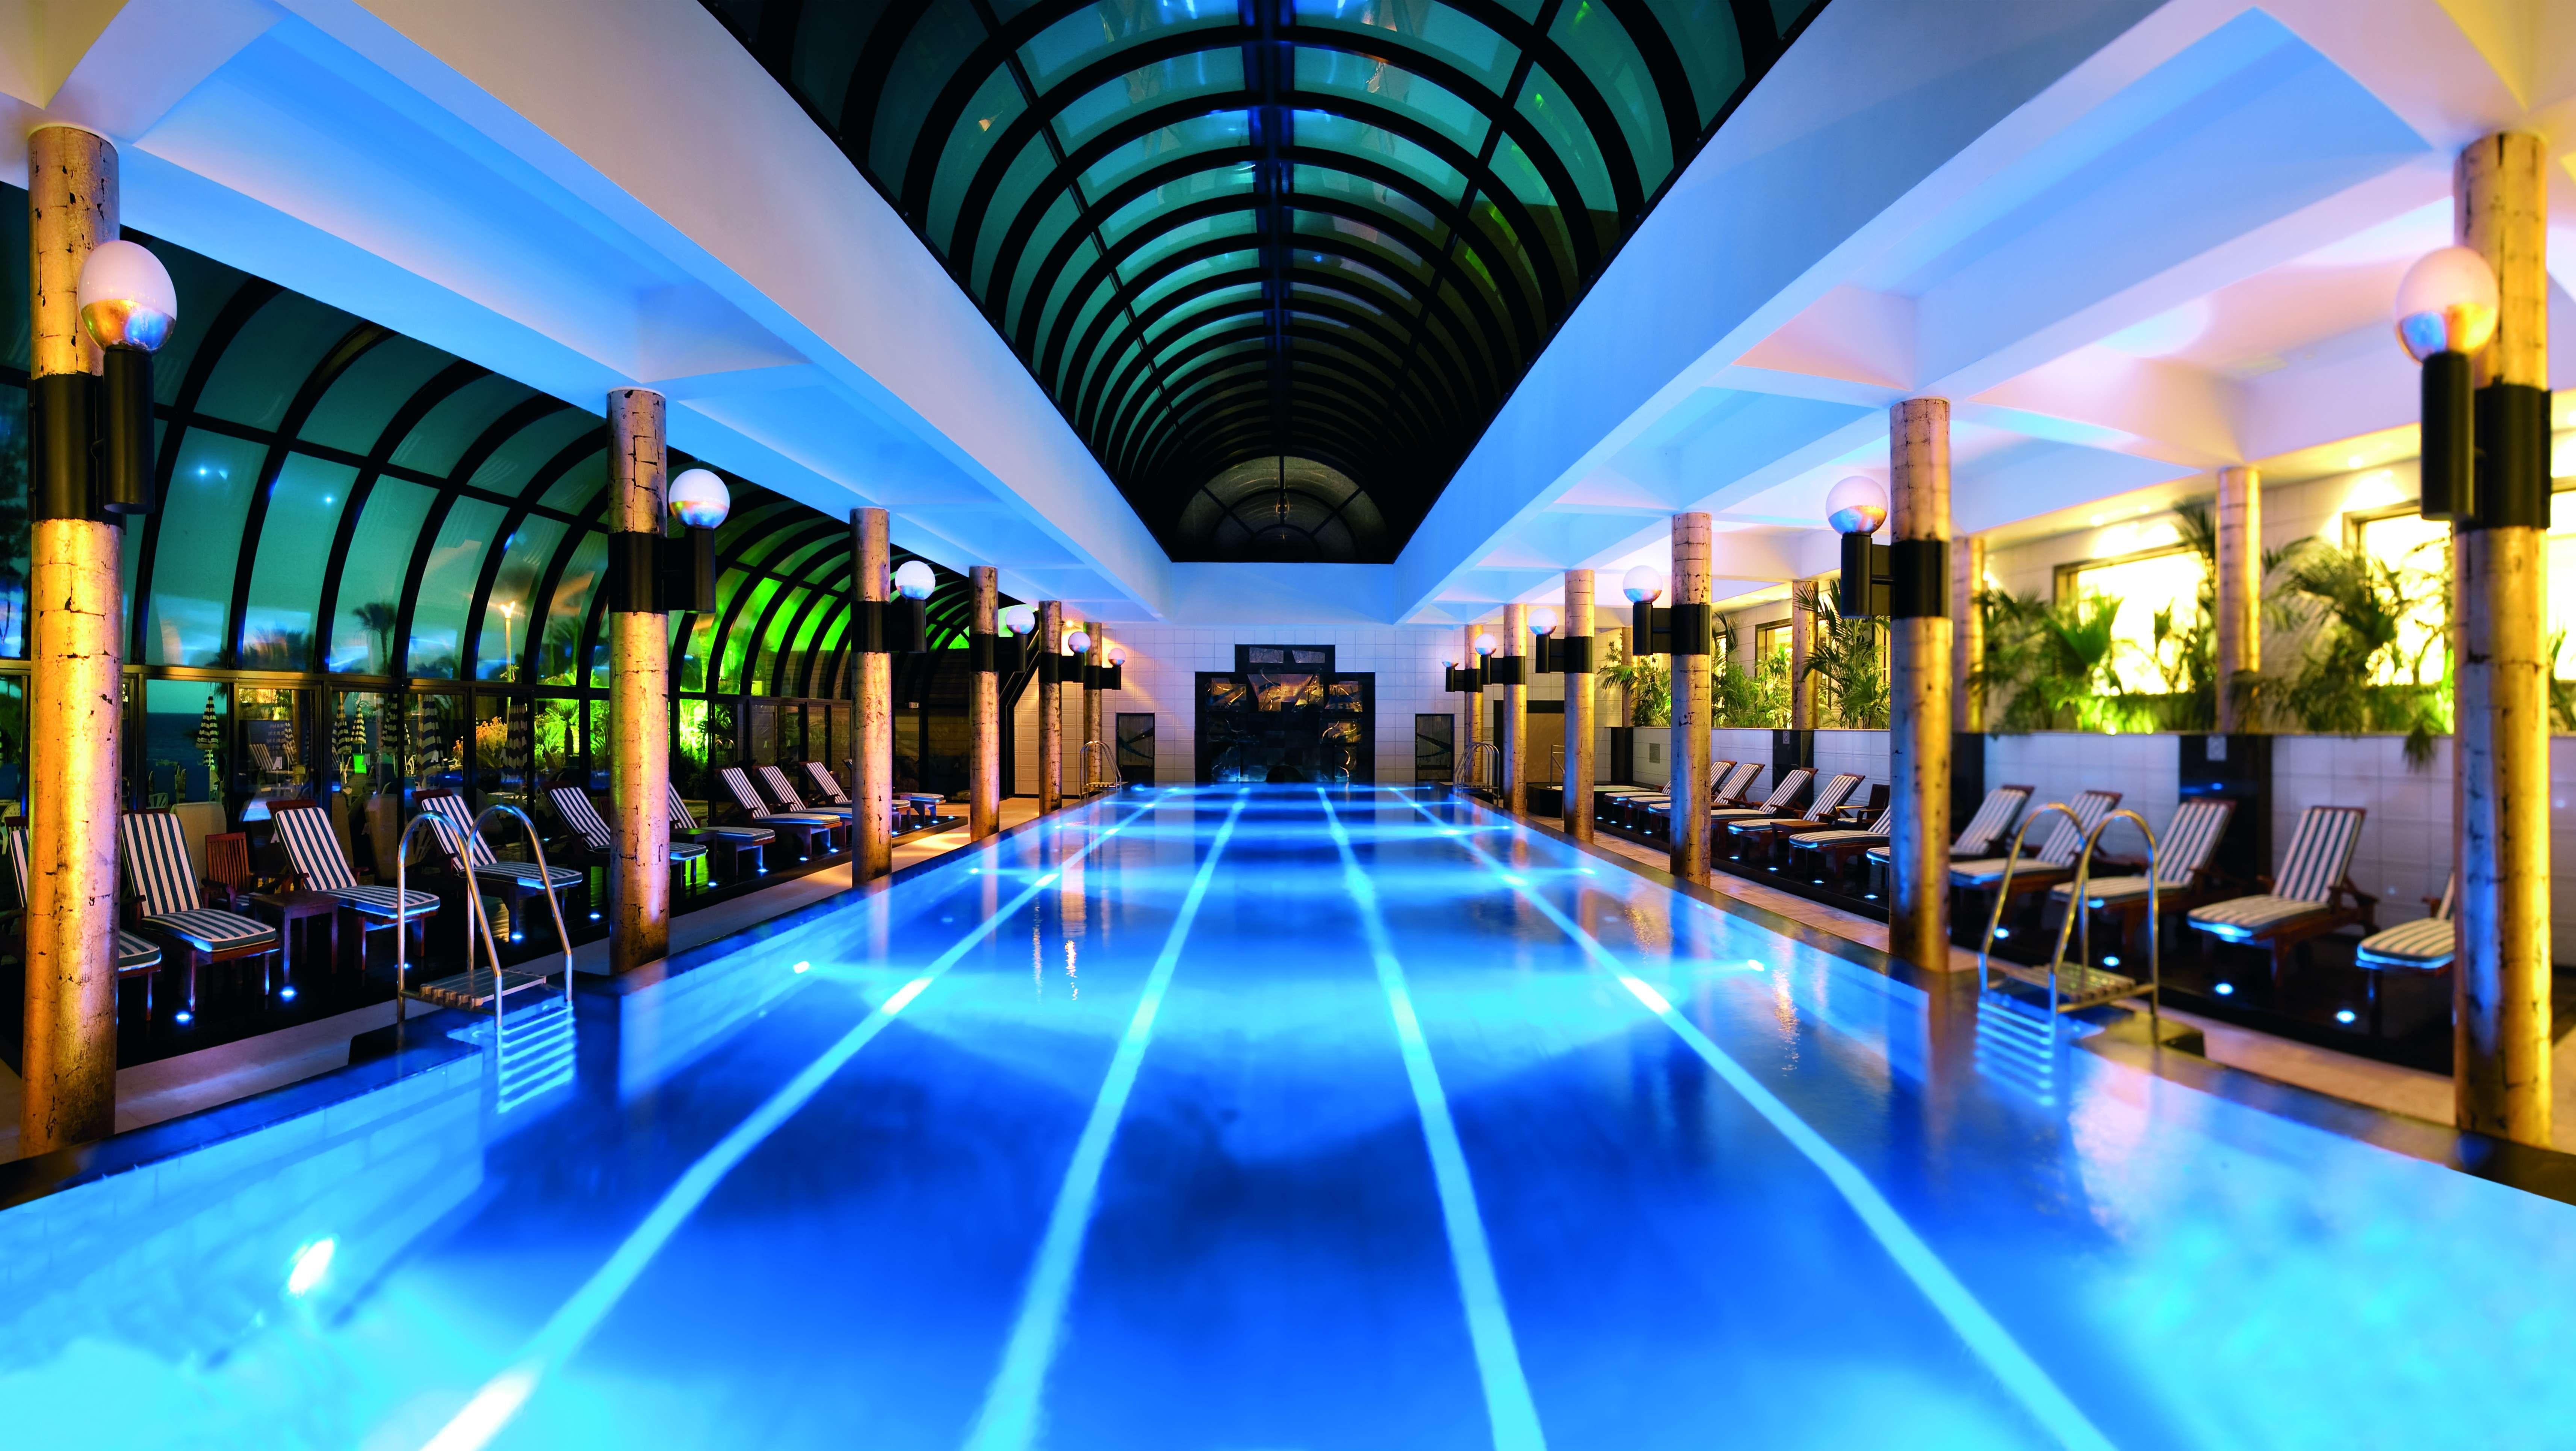 Indoor Pool At Amathus Beach Hotel, Limassol, Cyprus